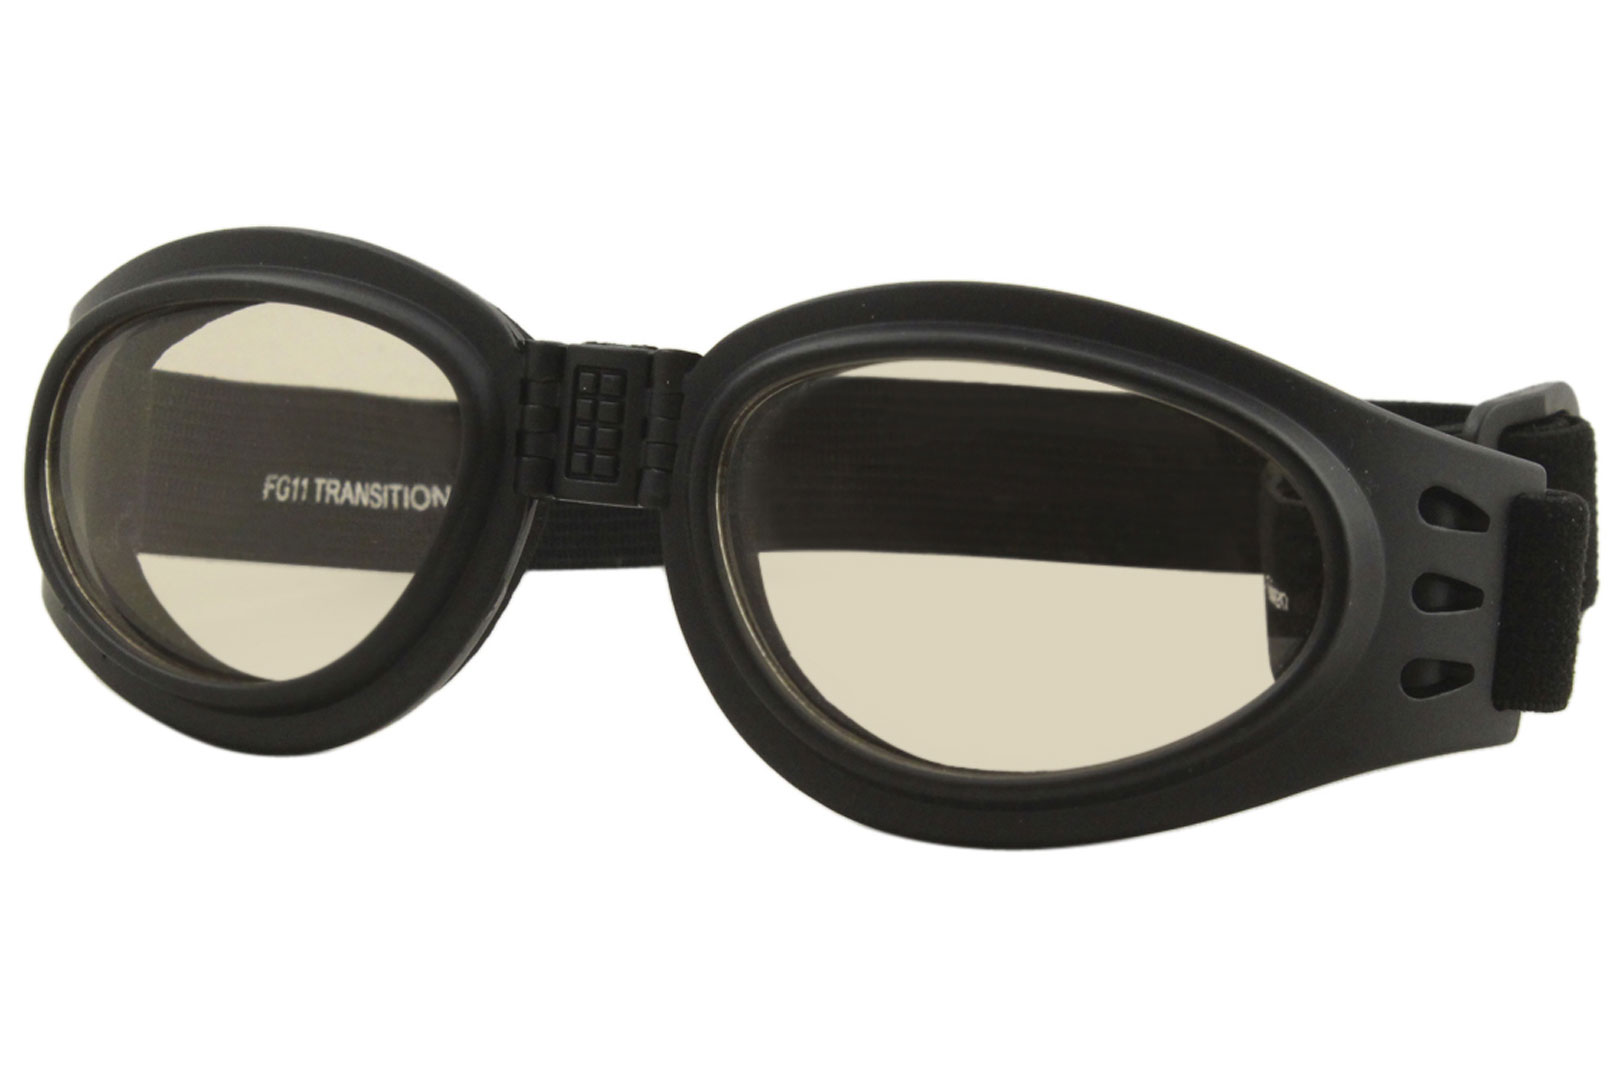 Men/'s Polarized Cycling Iridium Round Sunglasses Road Goggles Running Eyewear US